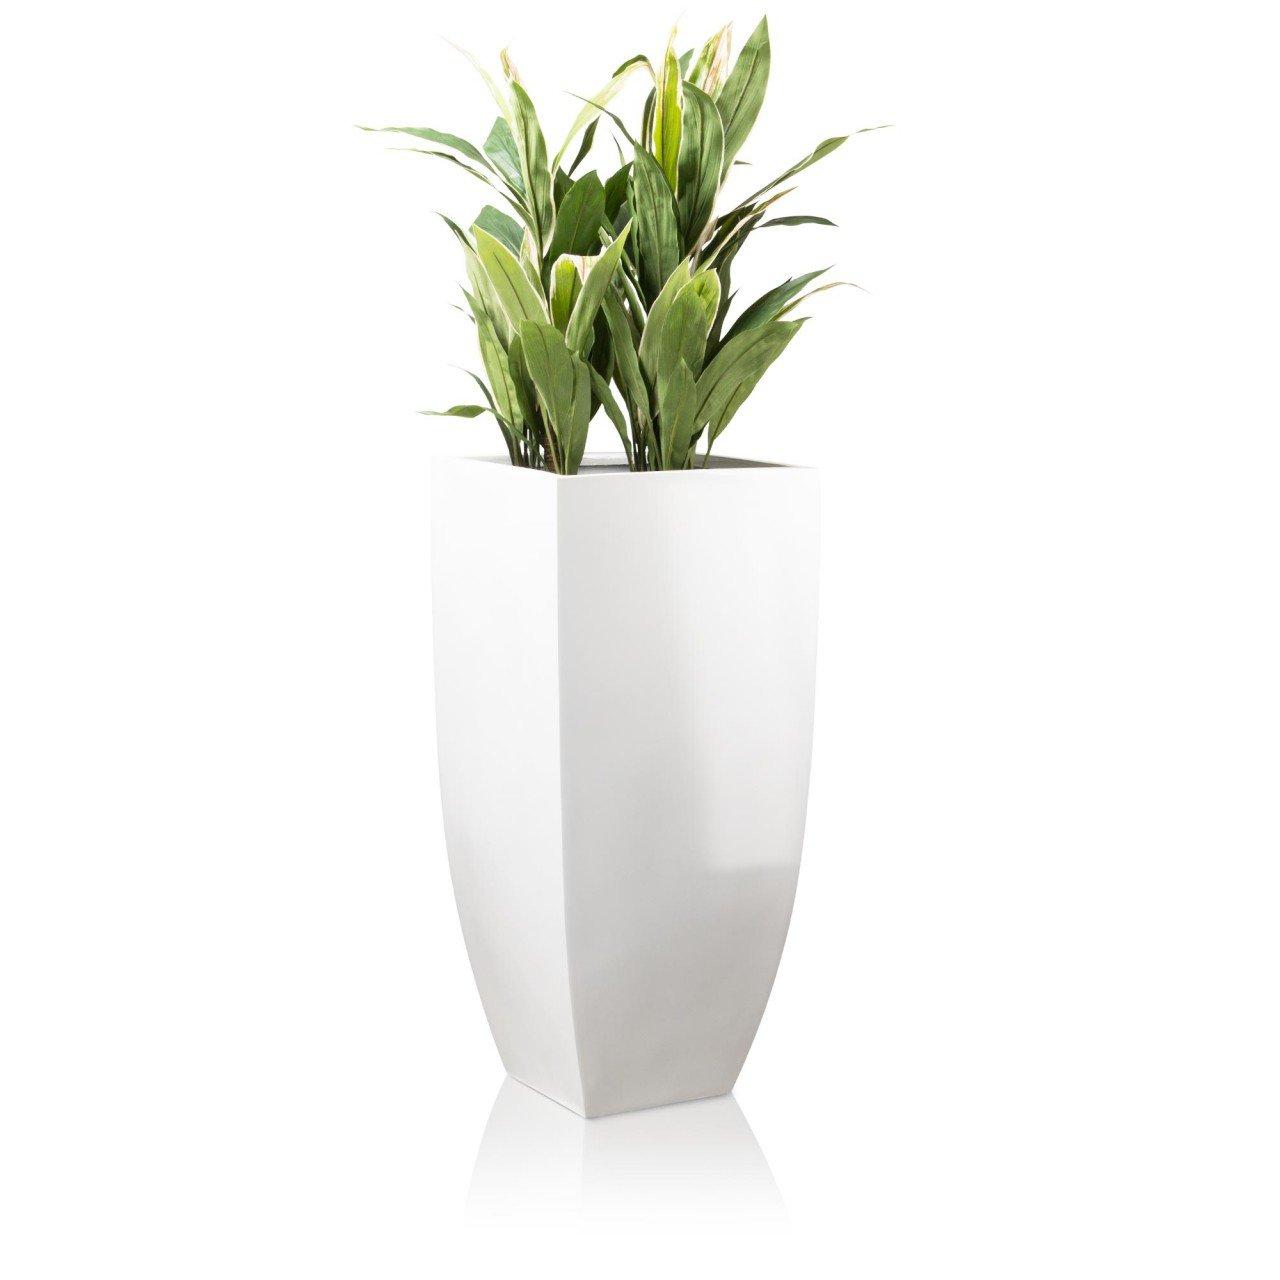 blumenk bel tarro alto fiberglas wei hochglanz decoras pflanzk bel g nstig kaufen. Black Bedroom Furniture Sets. Home Design Ideas